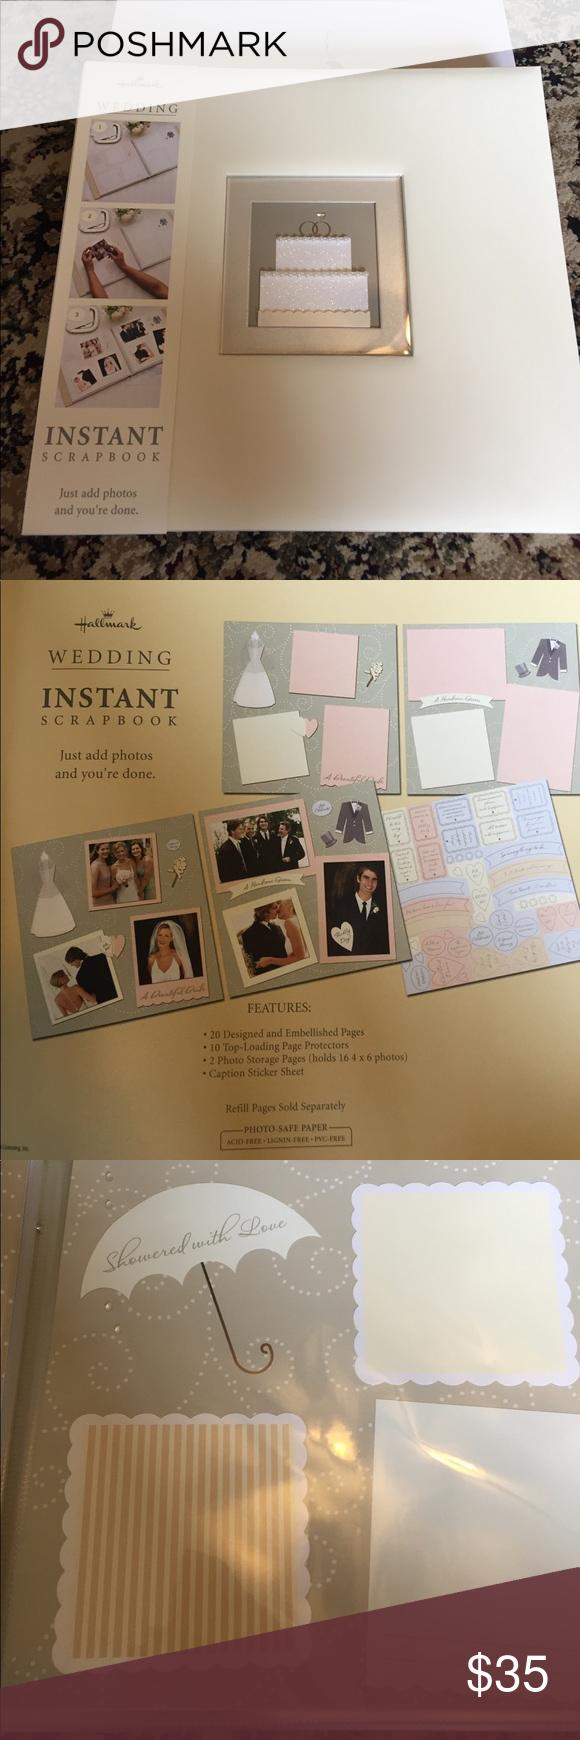 Wedding Hallmark Scrapbook Nwt Glitter Stickers Nwt 10 Top And